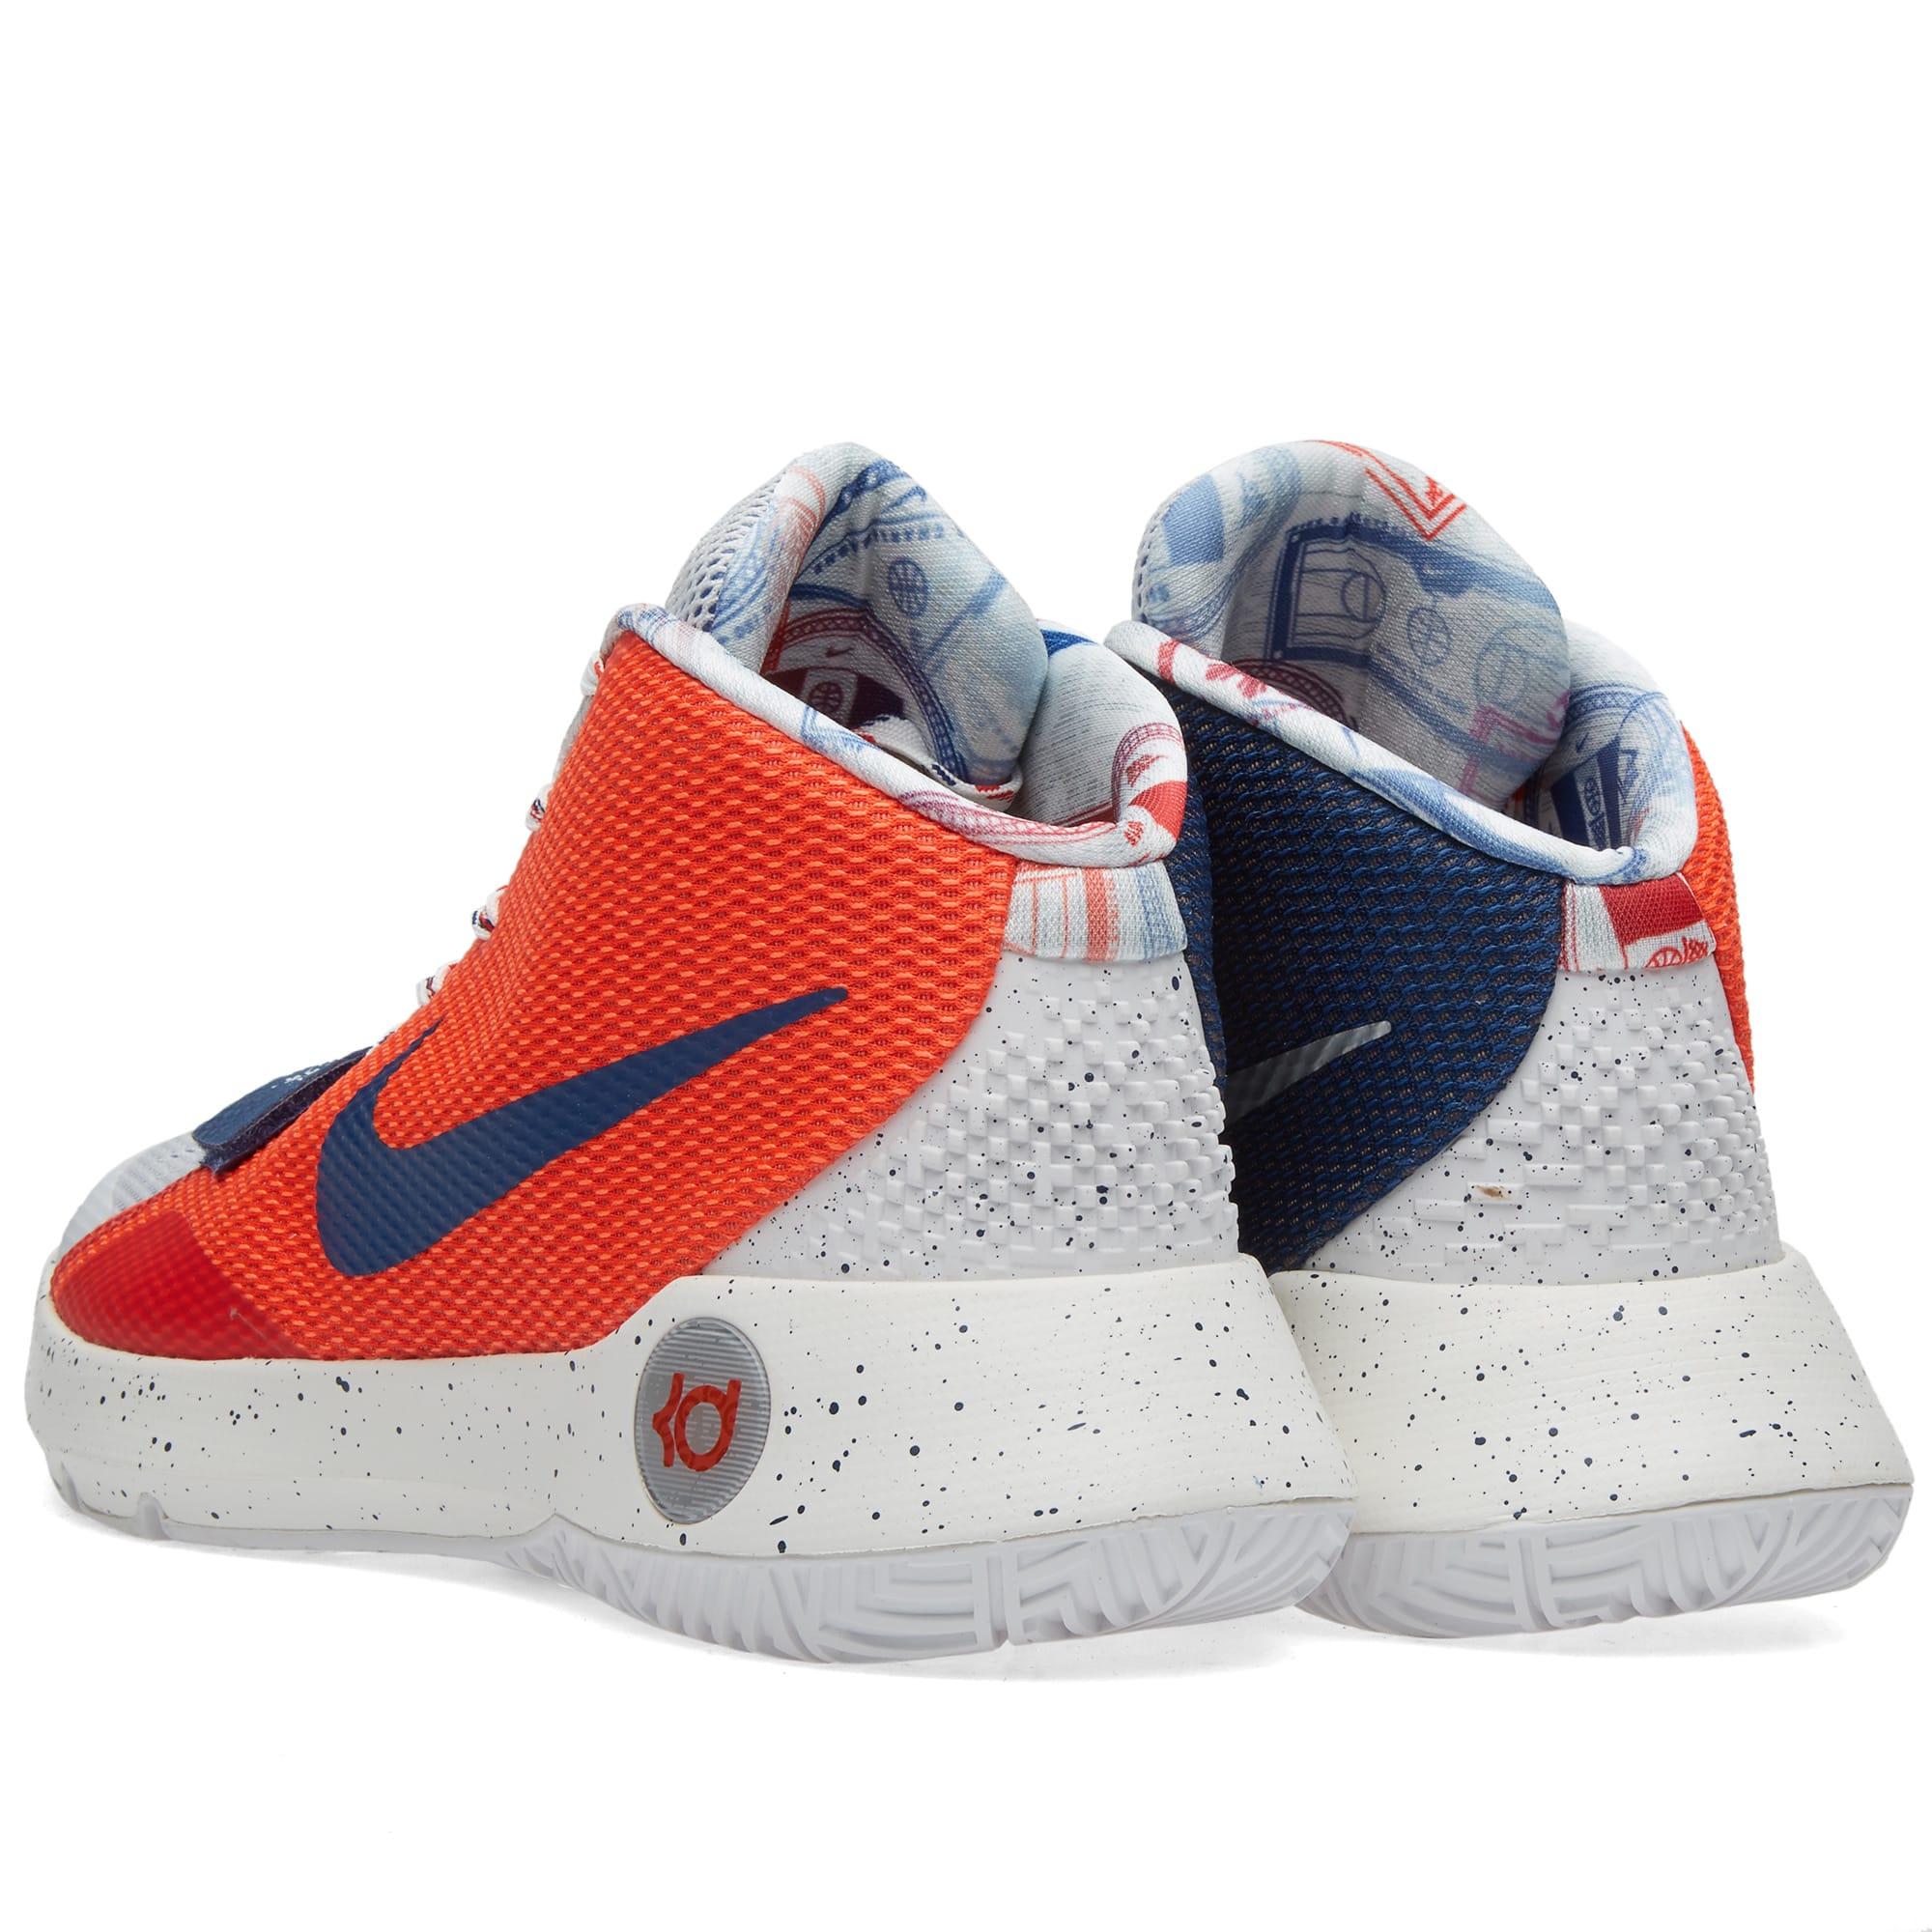 3a0edc6f6c Nike KD Trey 5 III LTD Multi & White | END.